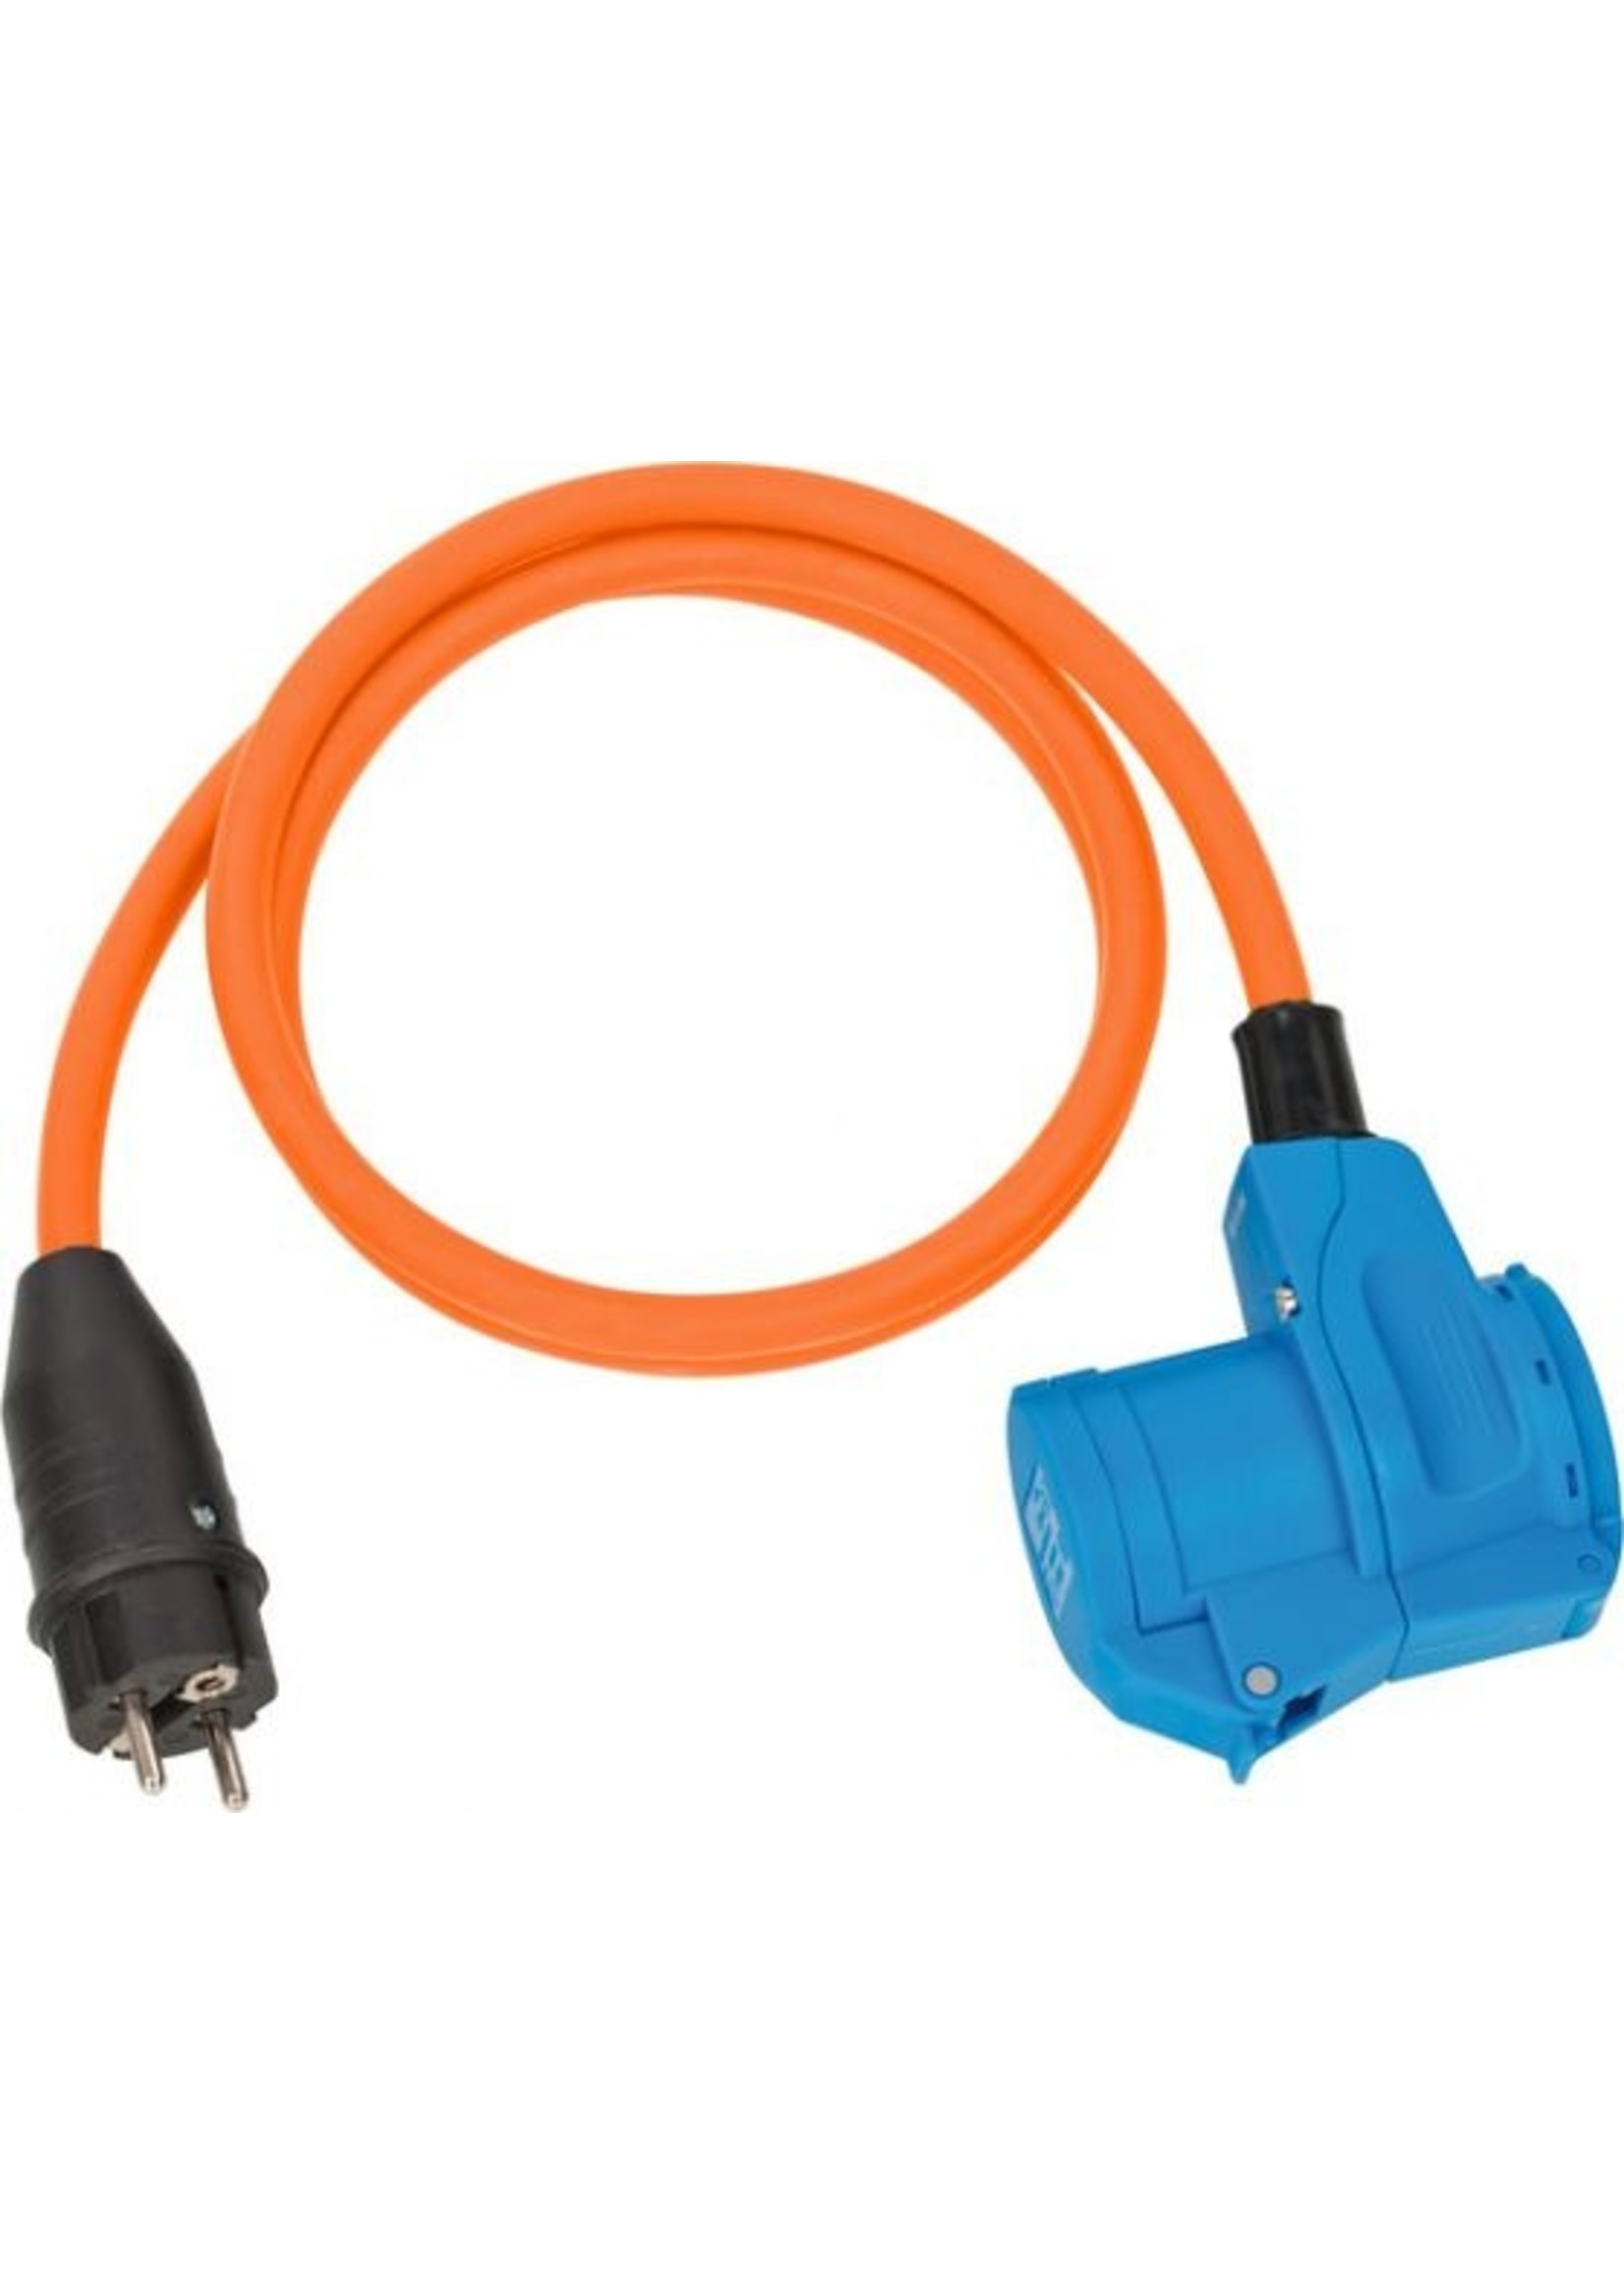 Brennenstuhl Brennenstuhl Adapterkabel CEE IP44 1.5m oranje H07RN-F 3G2.5 Beveiligingsstekker. haakse koppeling 230V/16A